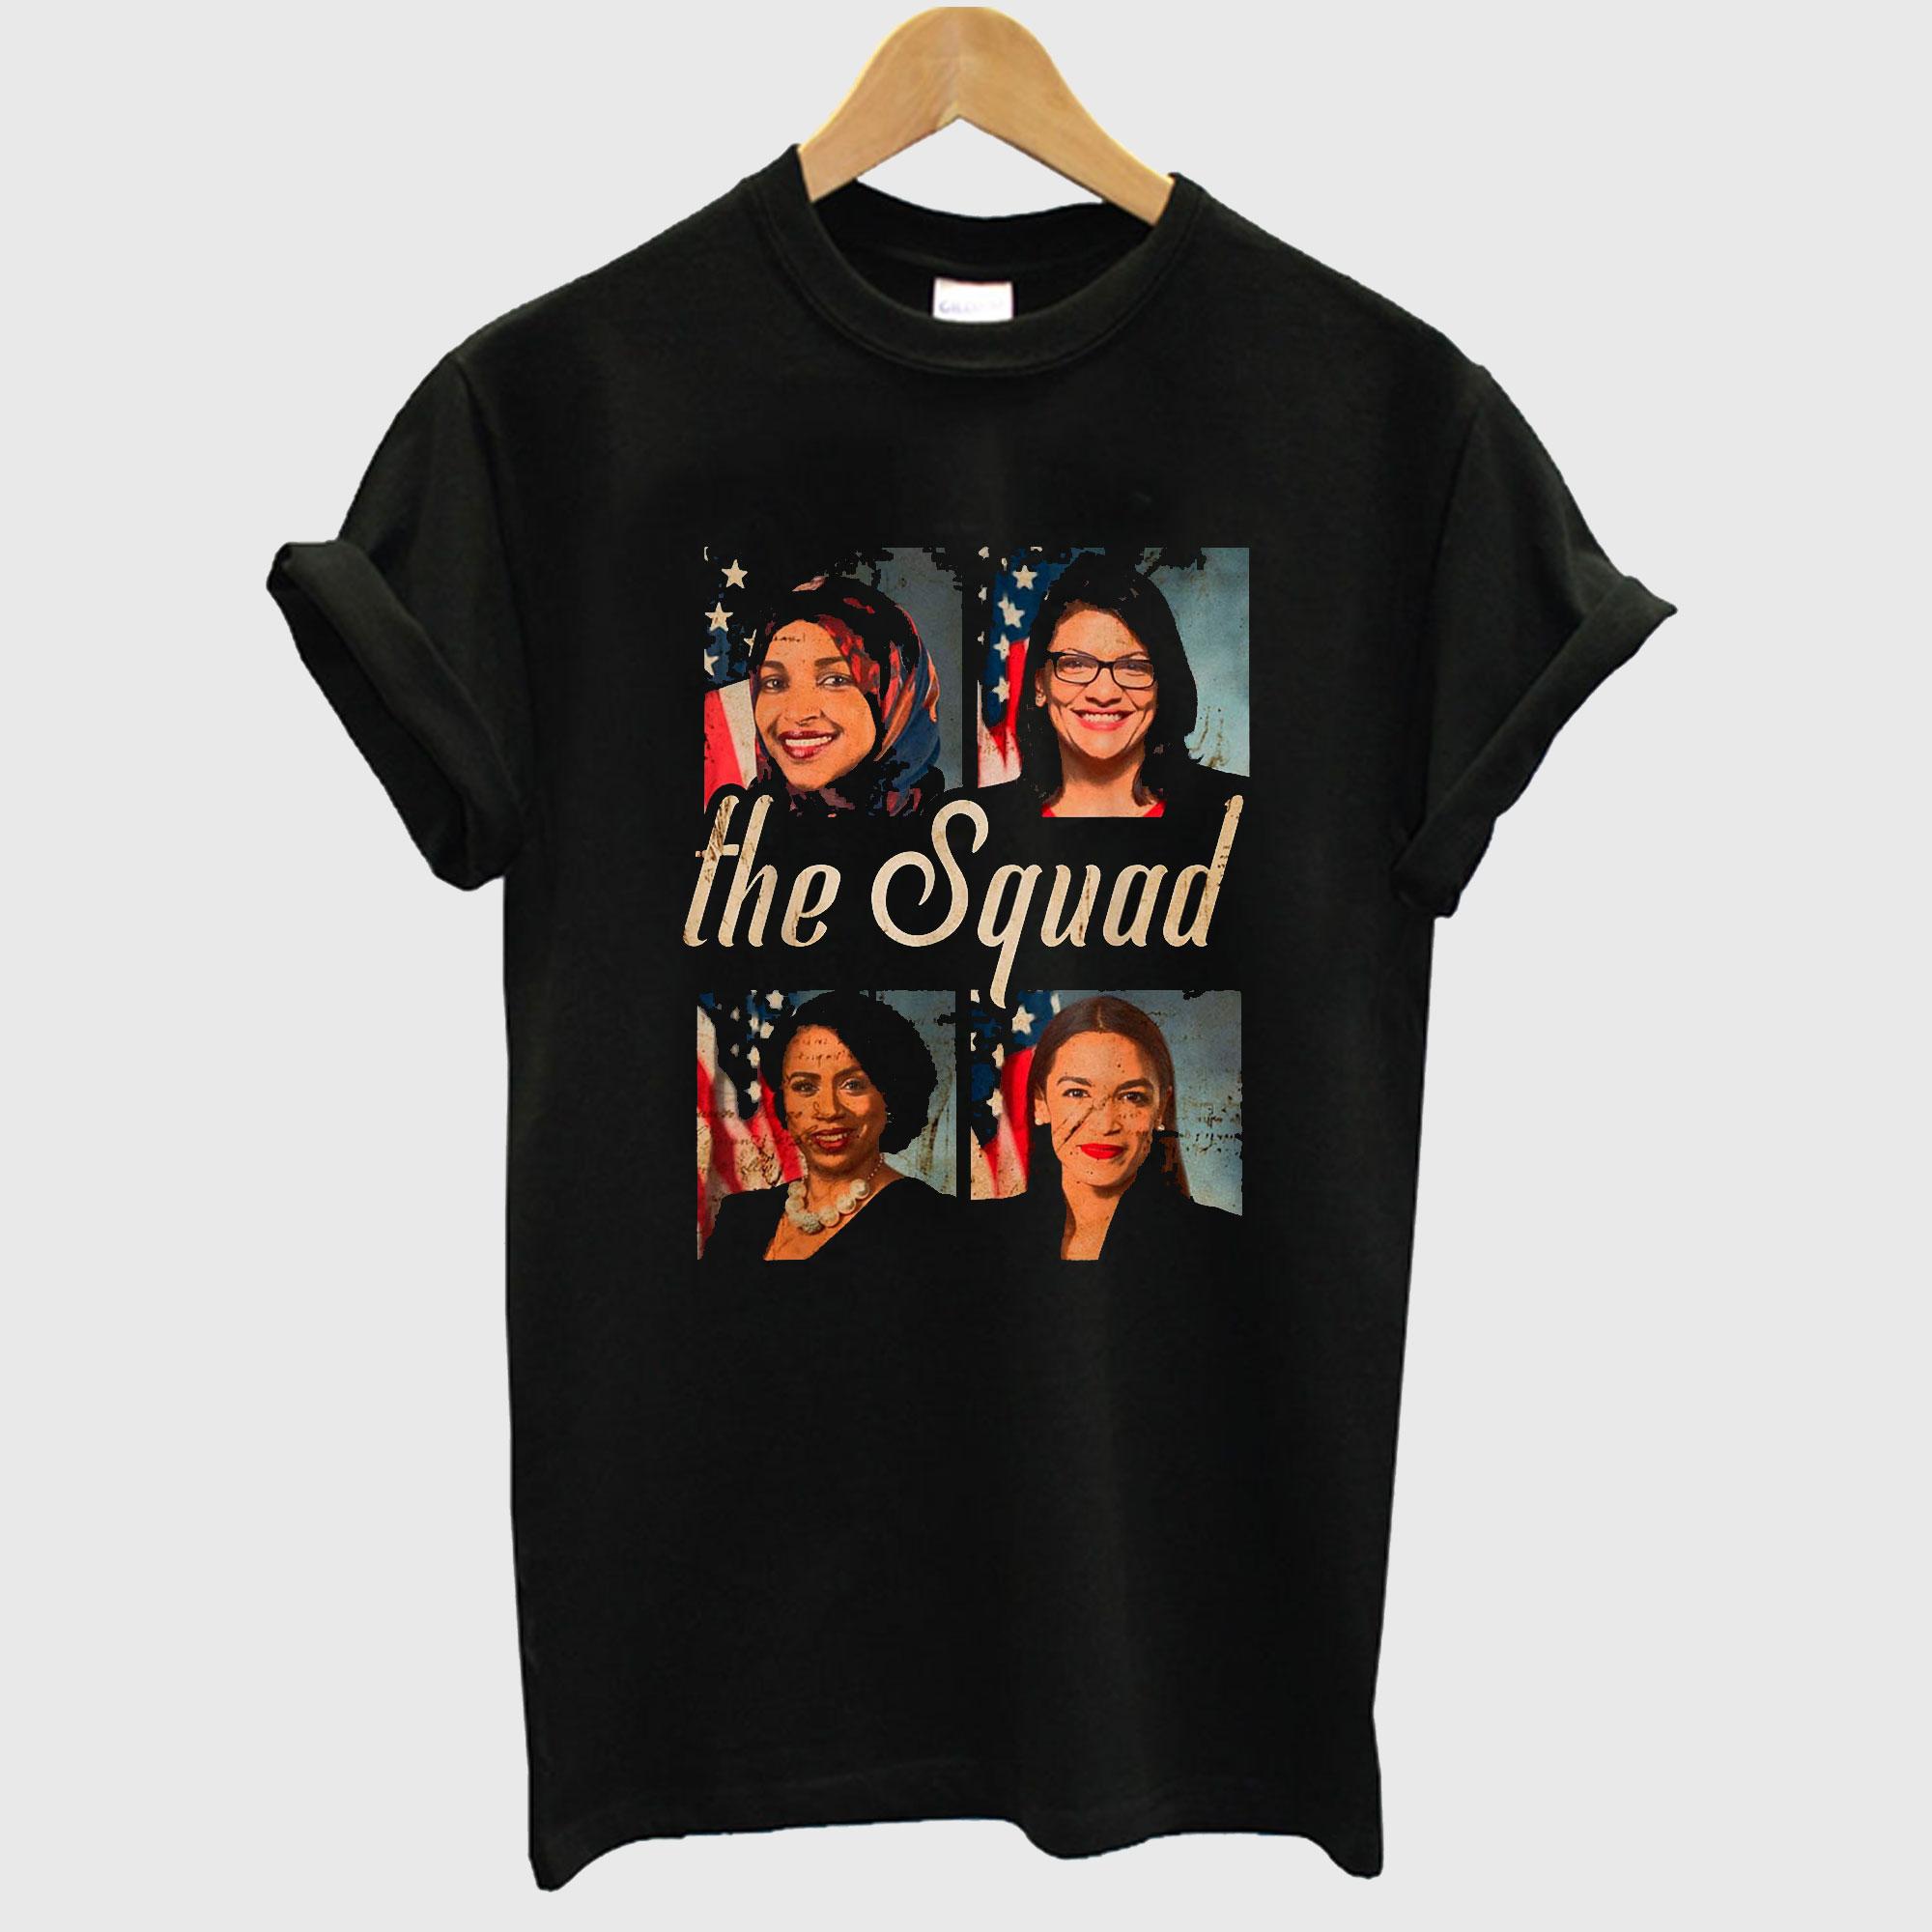 Squad AOC Rashida Tlaib Ilhan Omar Ayanna Pressley T shirt